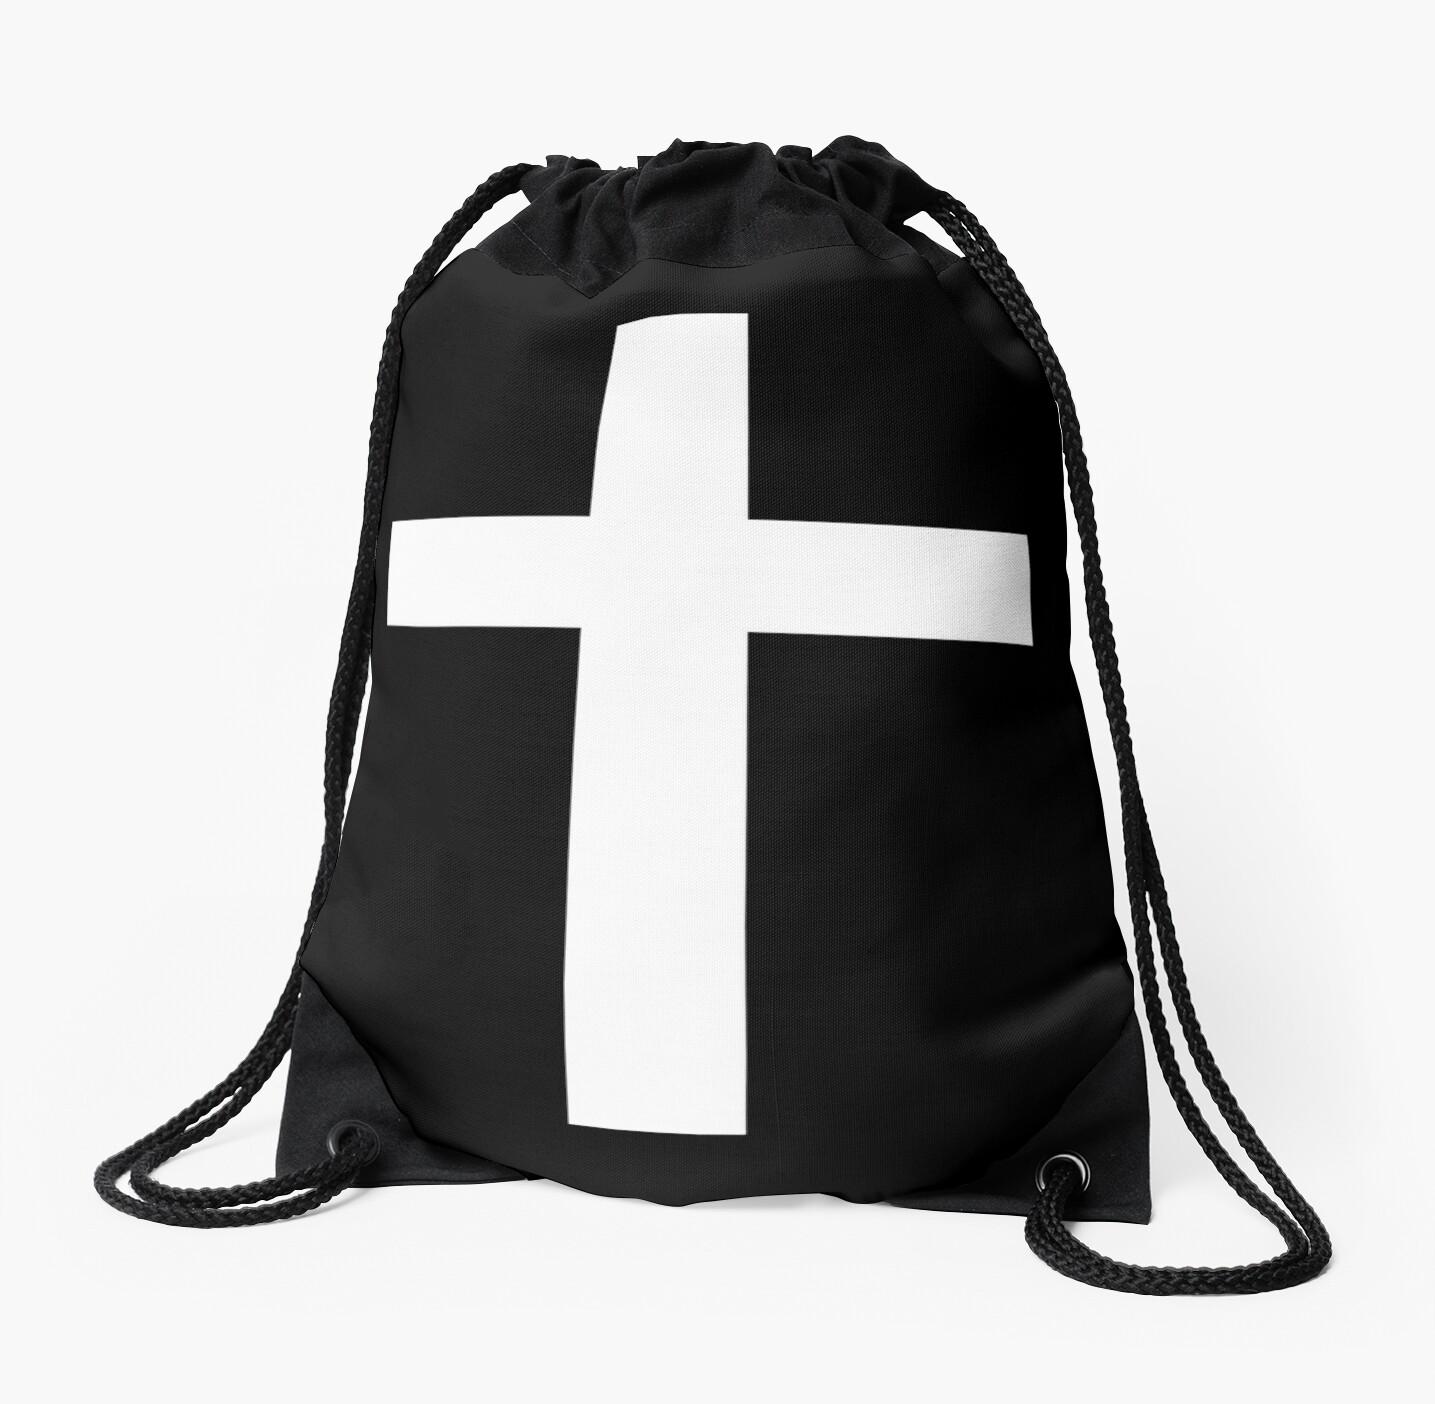 Christian Cross White on Black by cdsymbols